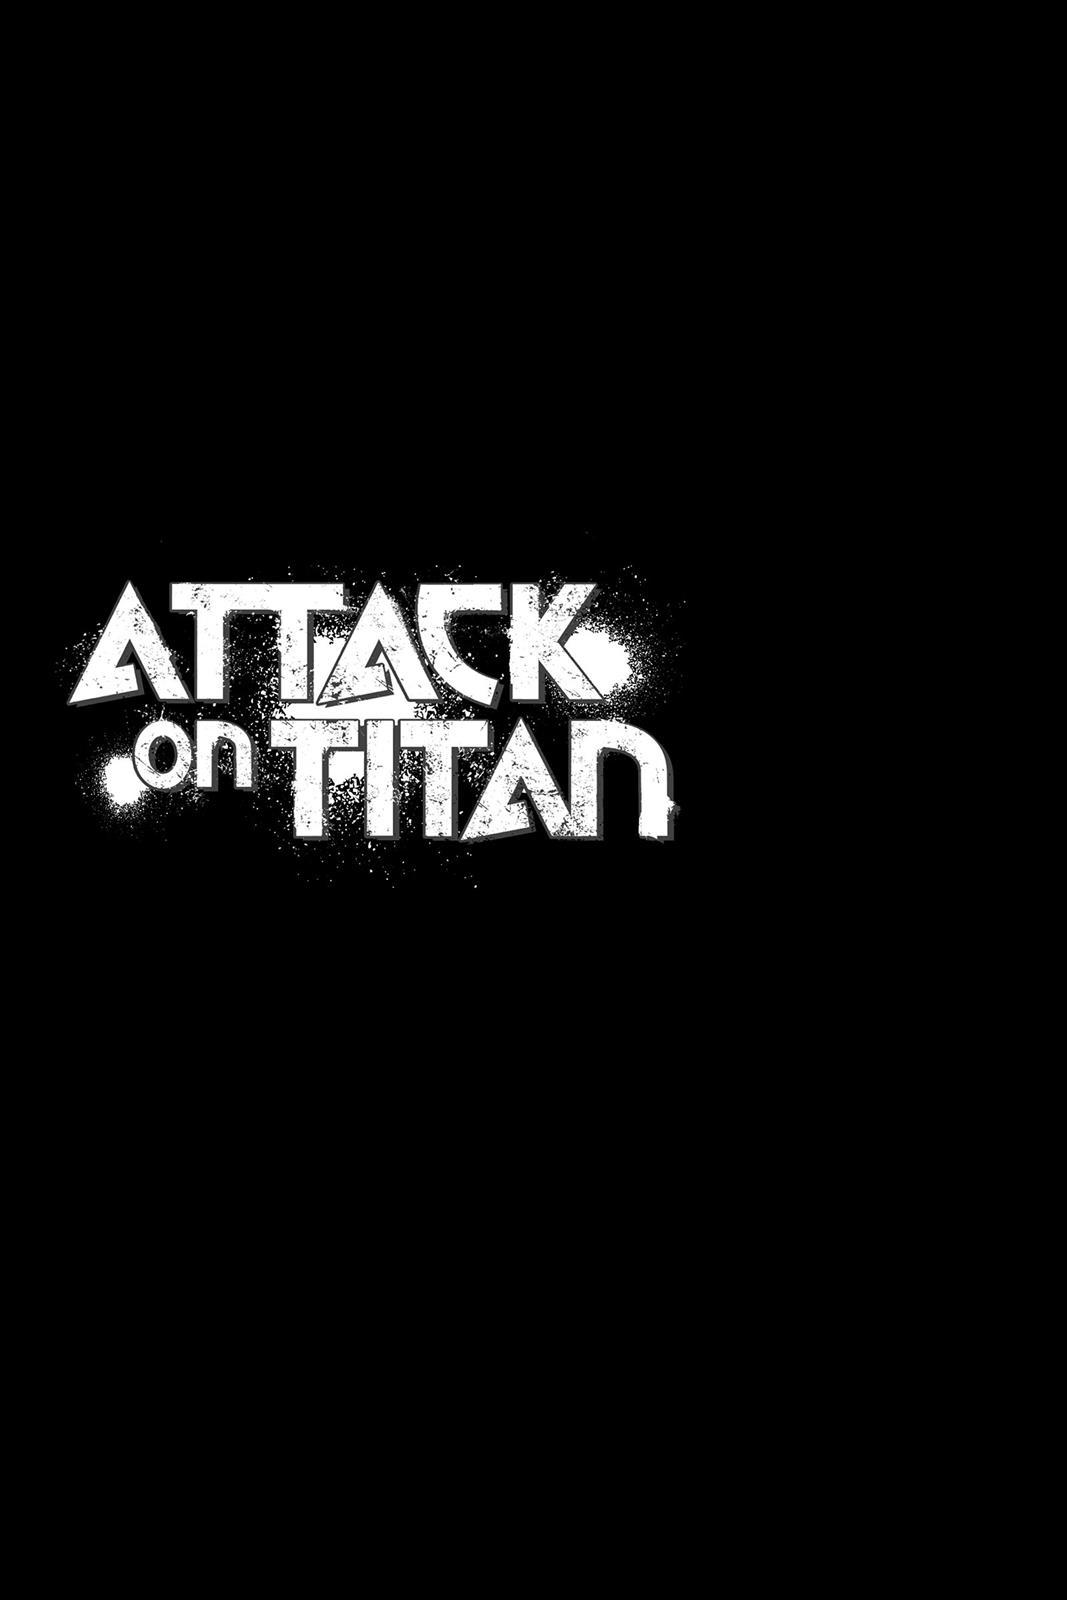 Attack On Titan, Episode 85 image 045